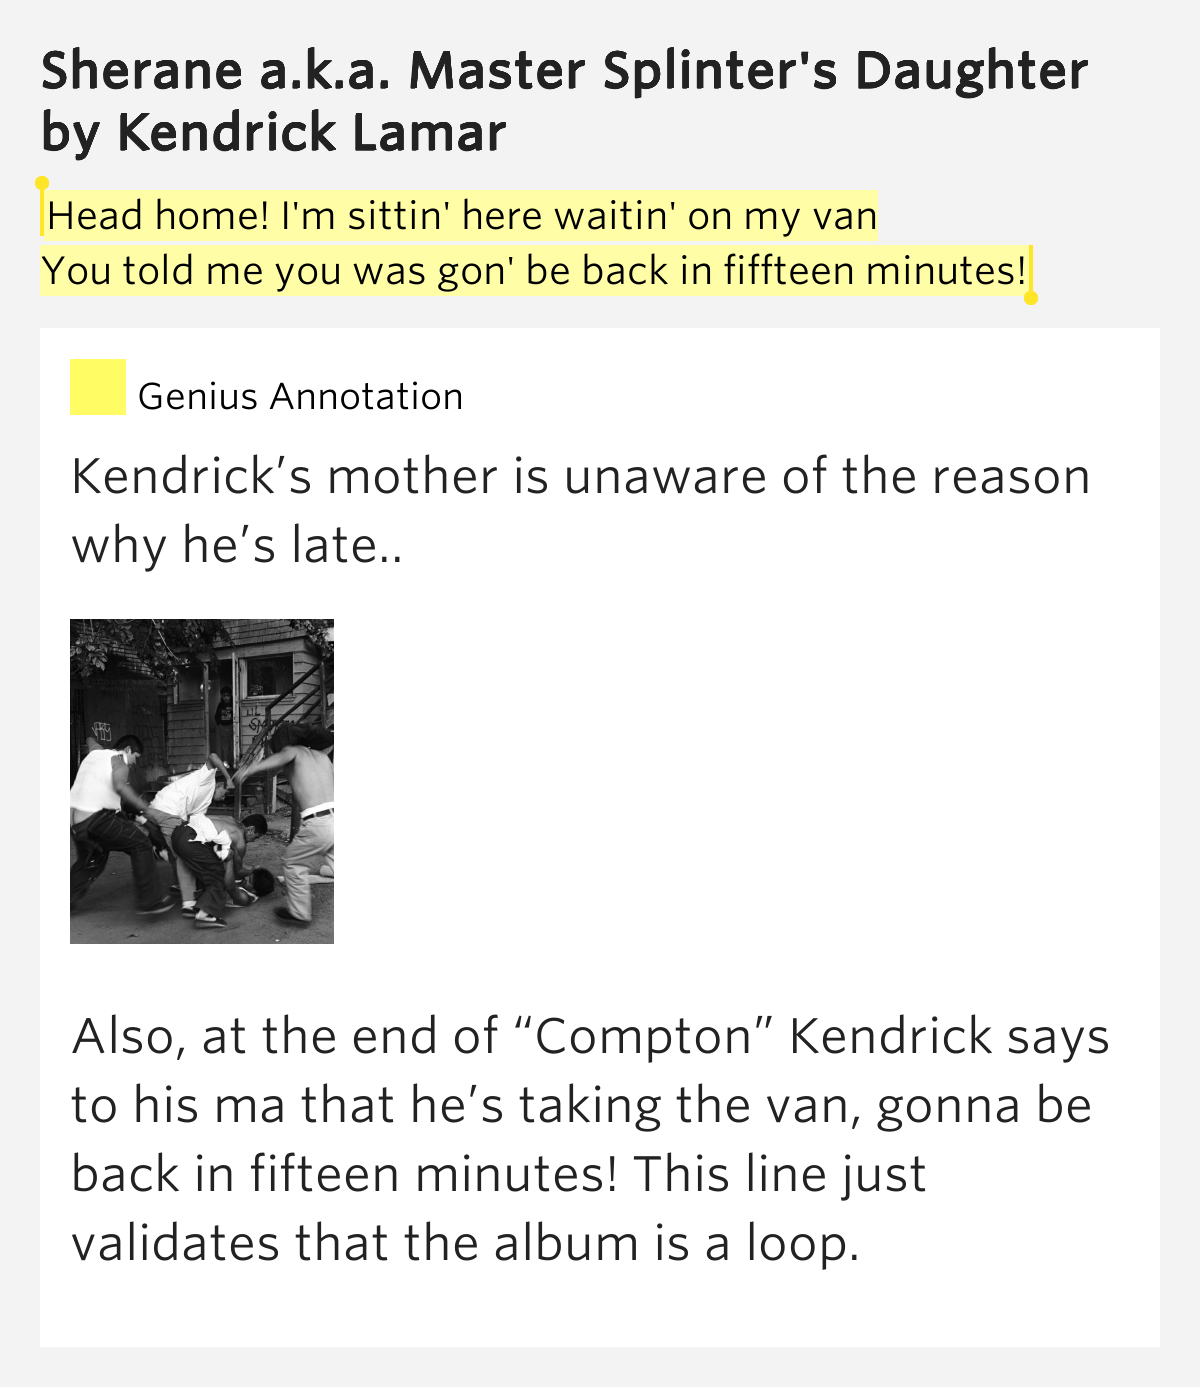 kendrick lamar dating sherane Kendrick lamar has a new girlfriend, woot woot  no more sherane click to expand may 11,  keep being a captain to kendrick lamar.